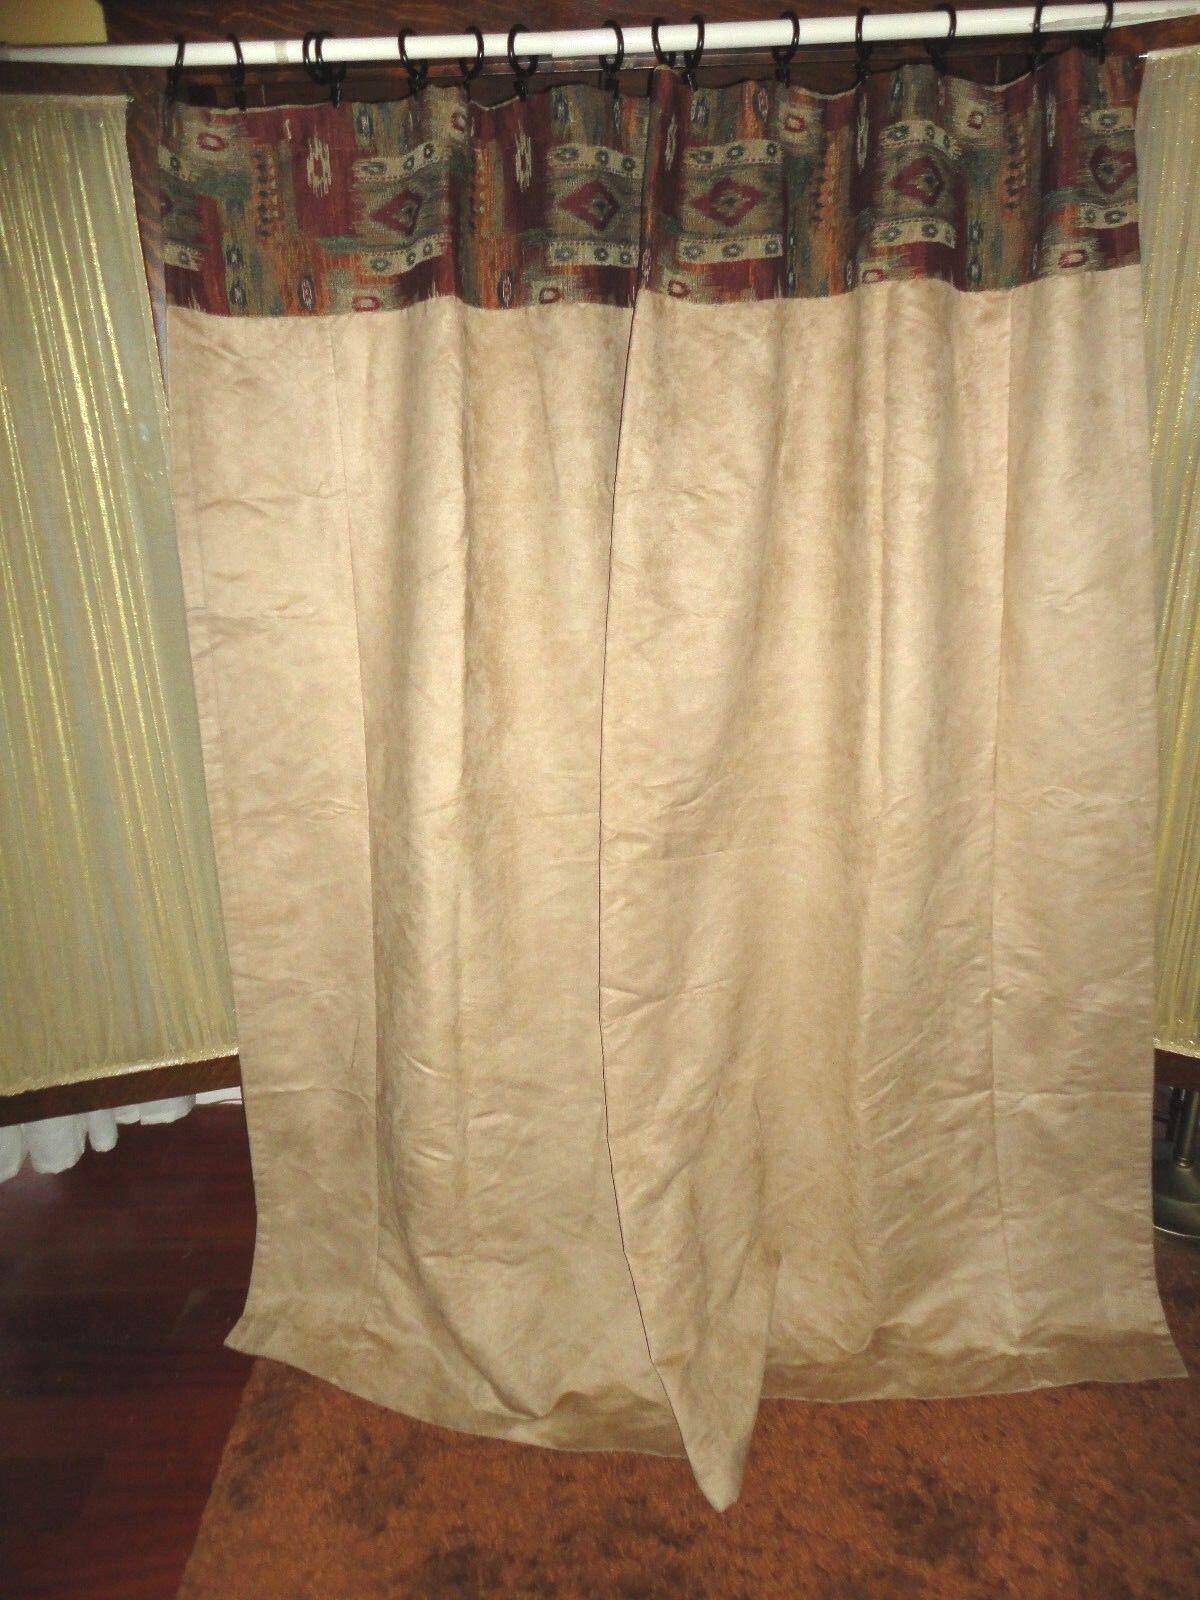 LINCOLN TEXTILE FAUX SUEDE TAN Rot SOUTHWESTERN FABRIC SHOWER CURTAIN 72 X 69 8822da